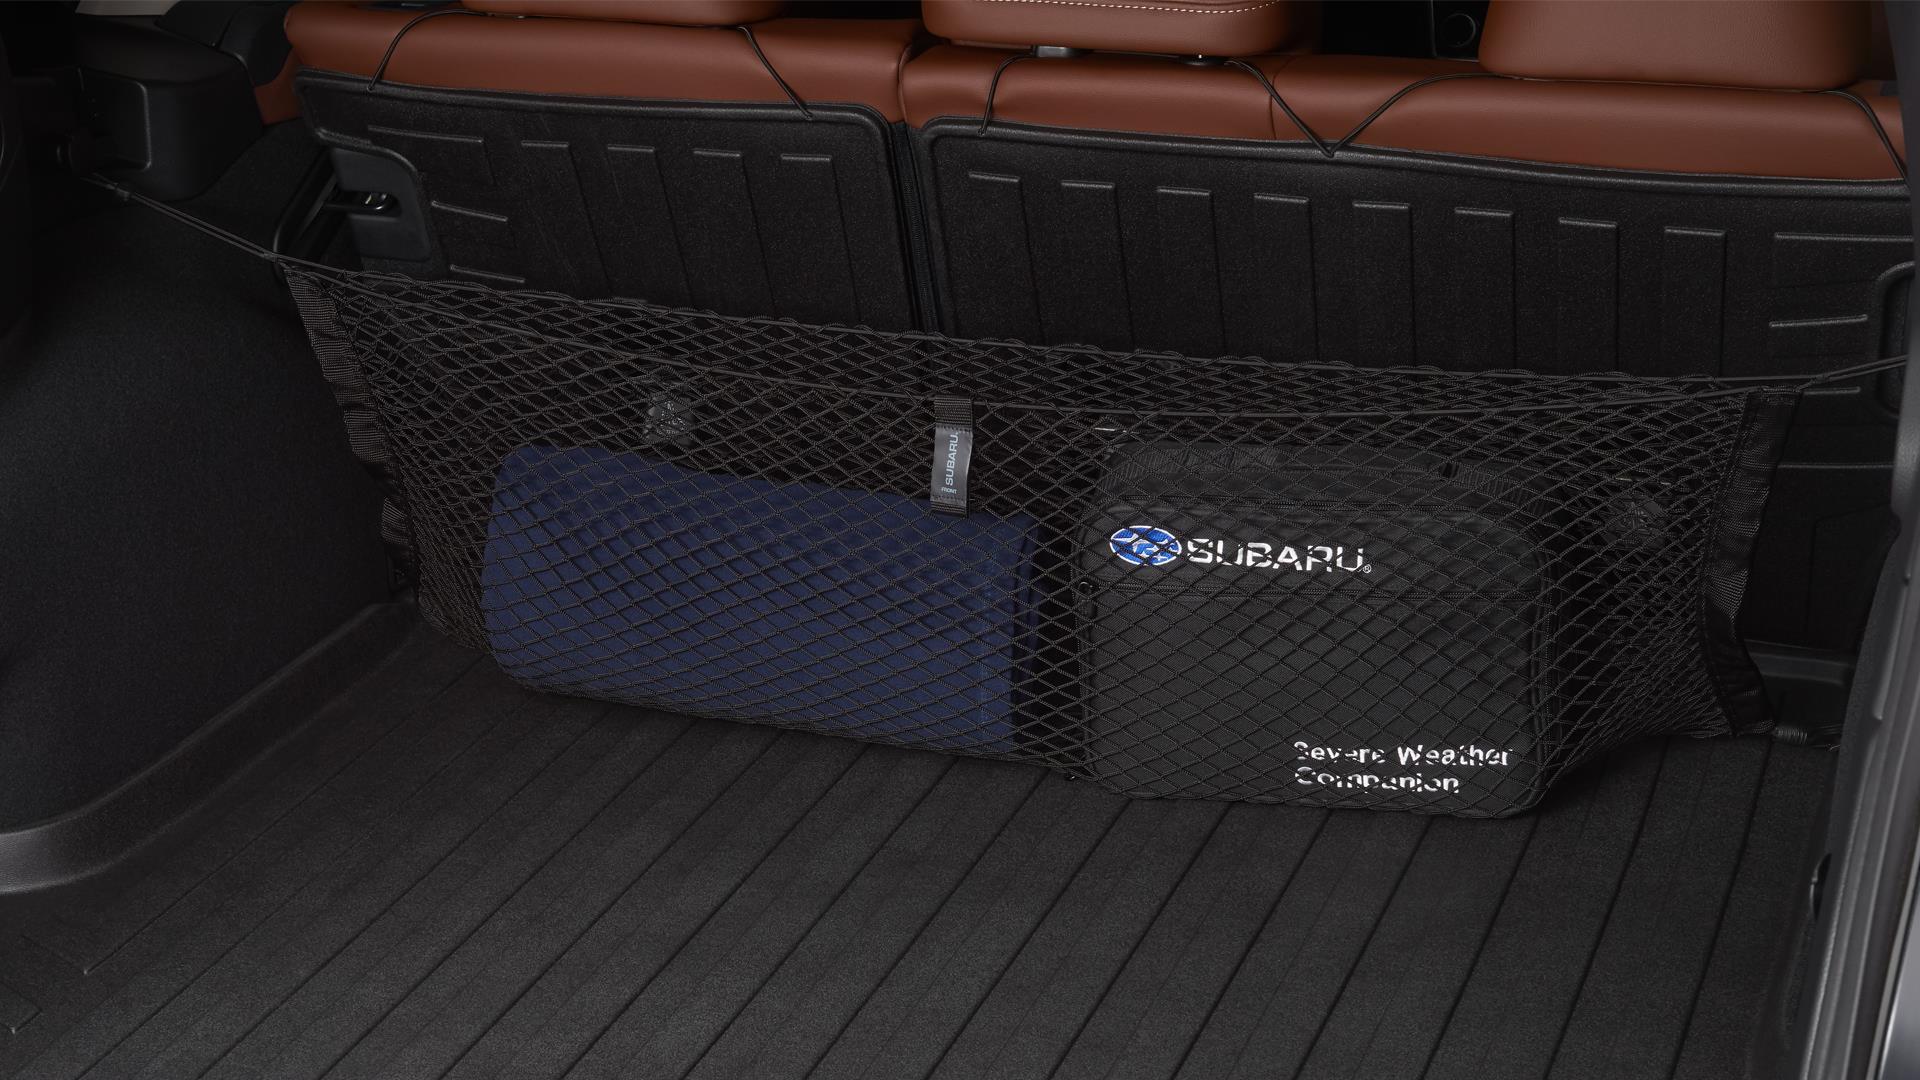 2018 Subaru Outback Cargo Net Rear Seatback F551sal011